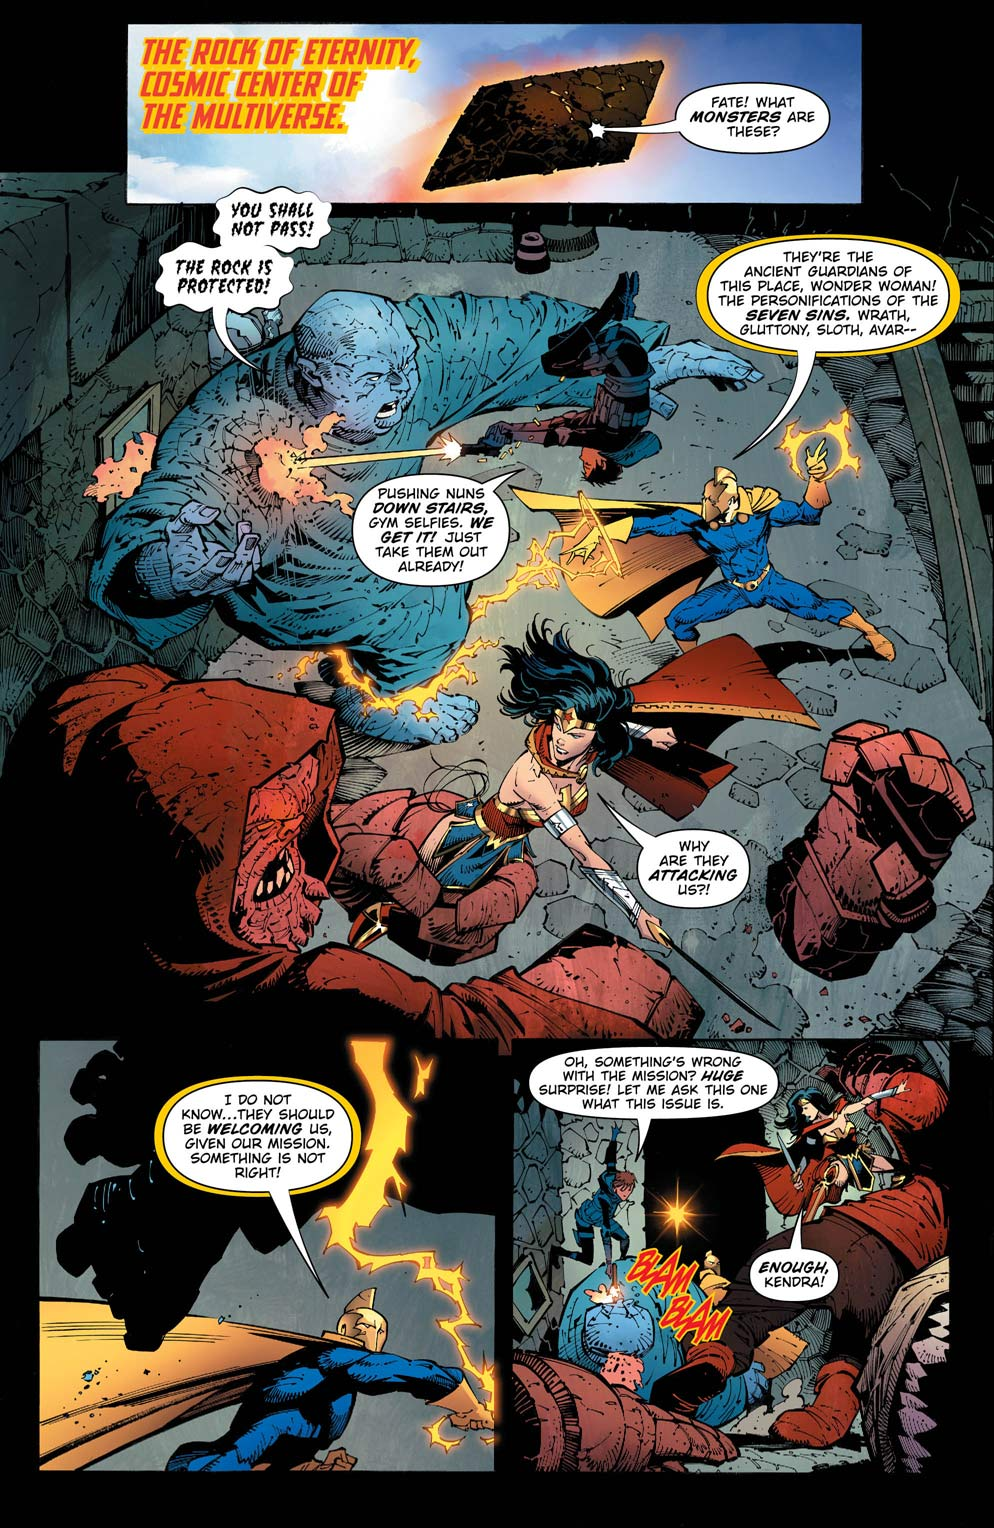 Dark Nights Metal 4_4 - DC Comics News